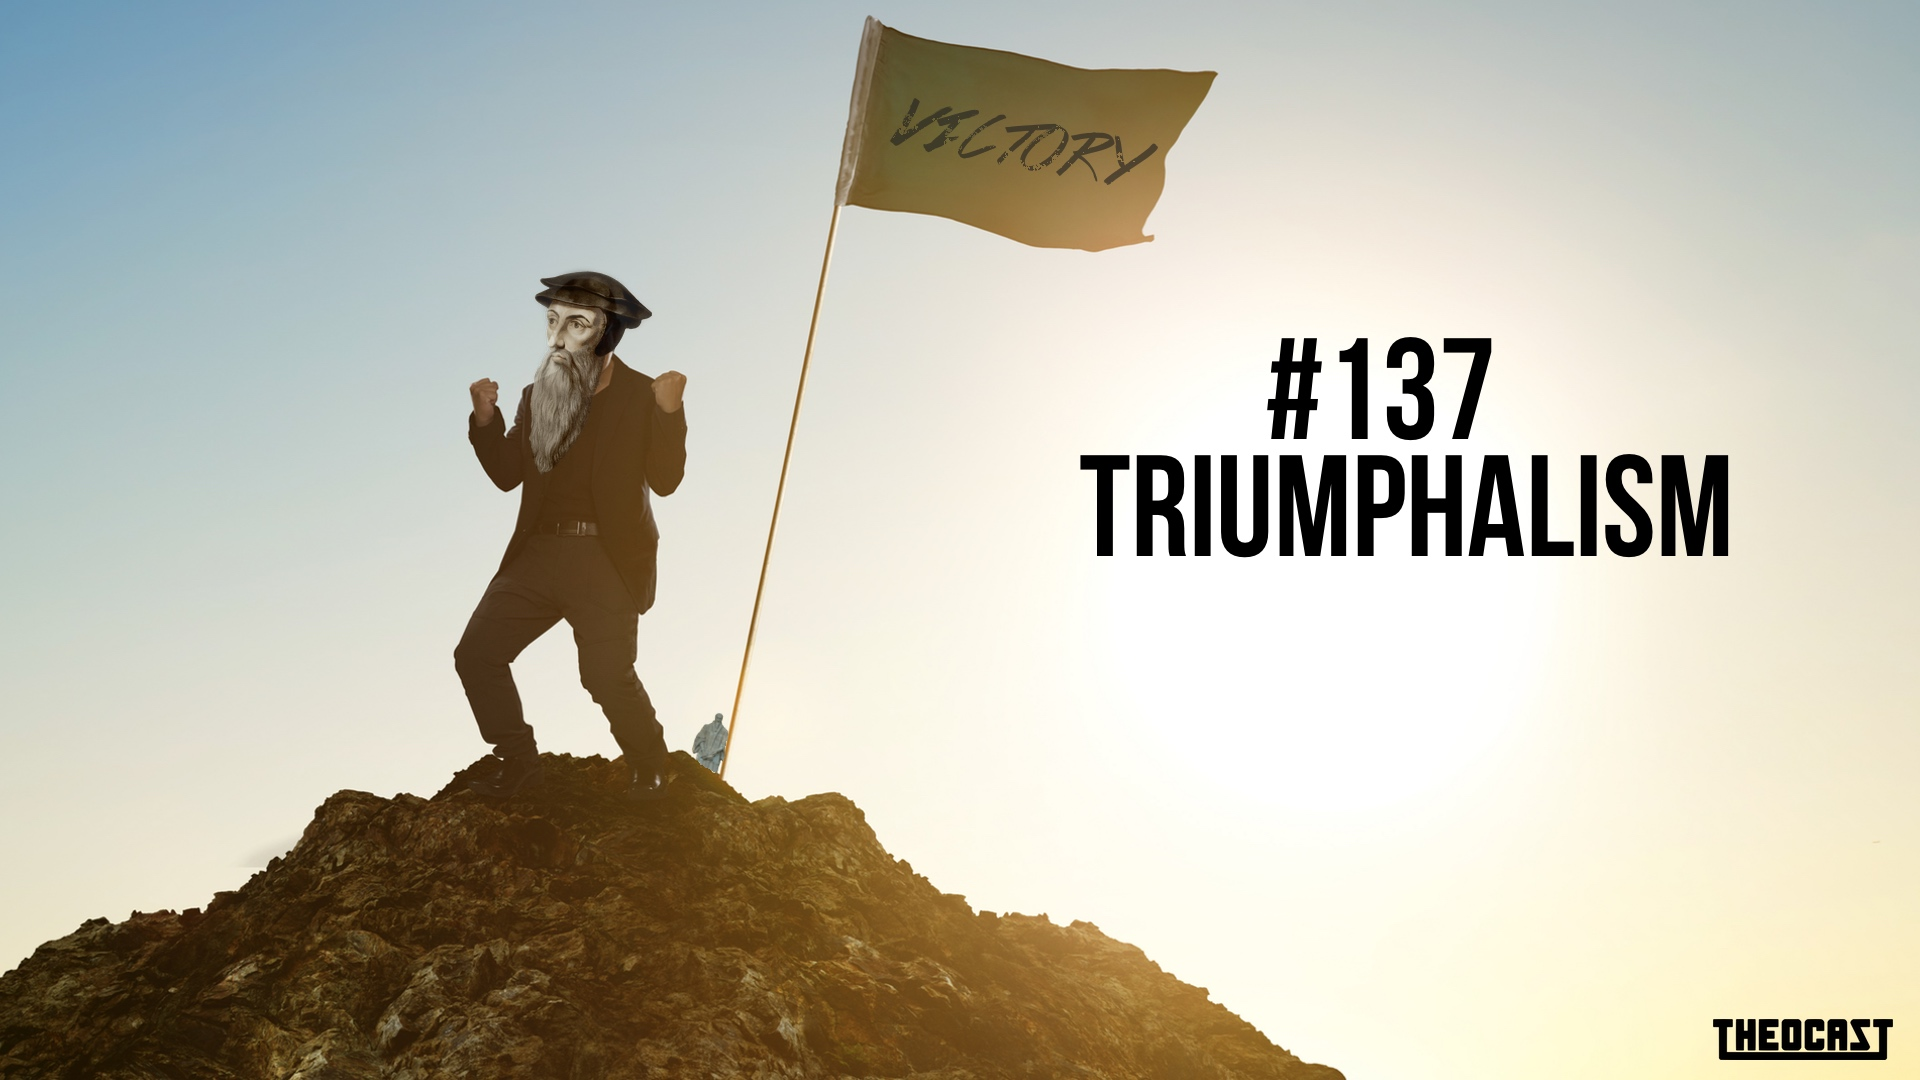 #137 Triumphalism